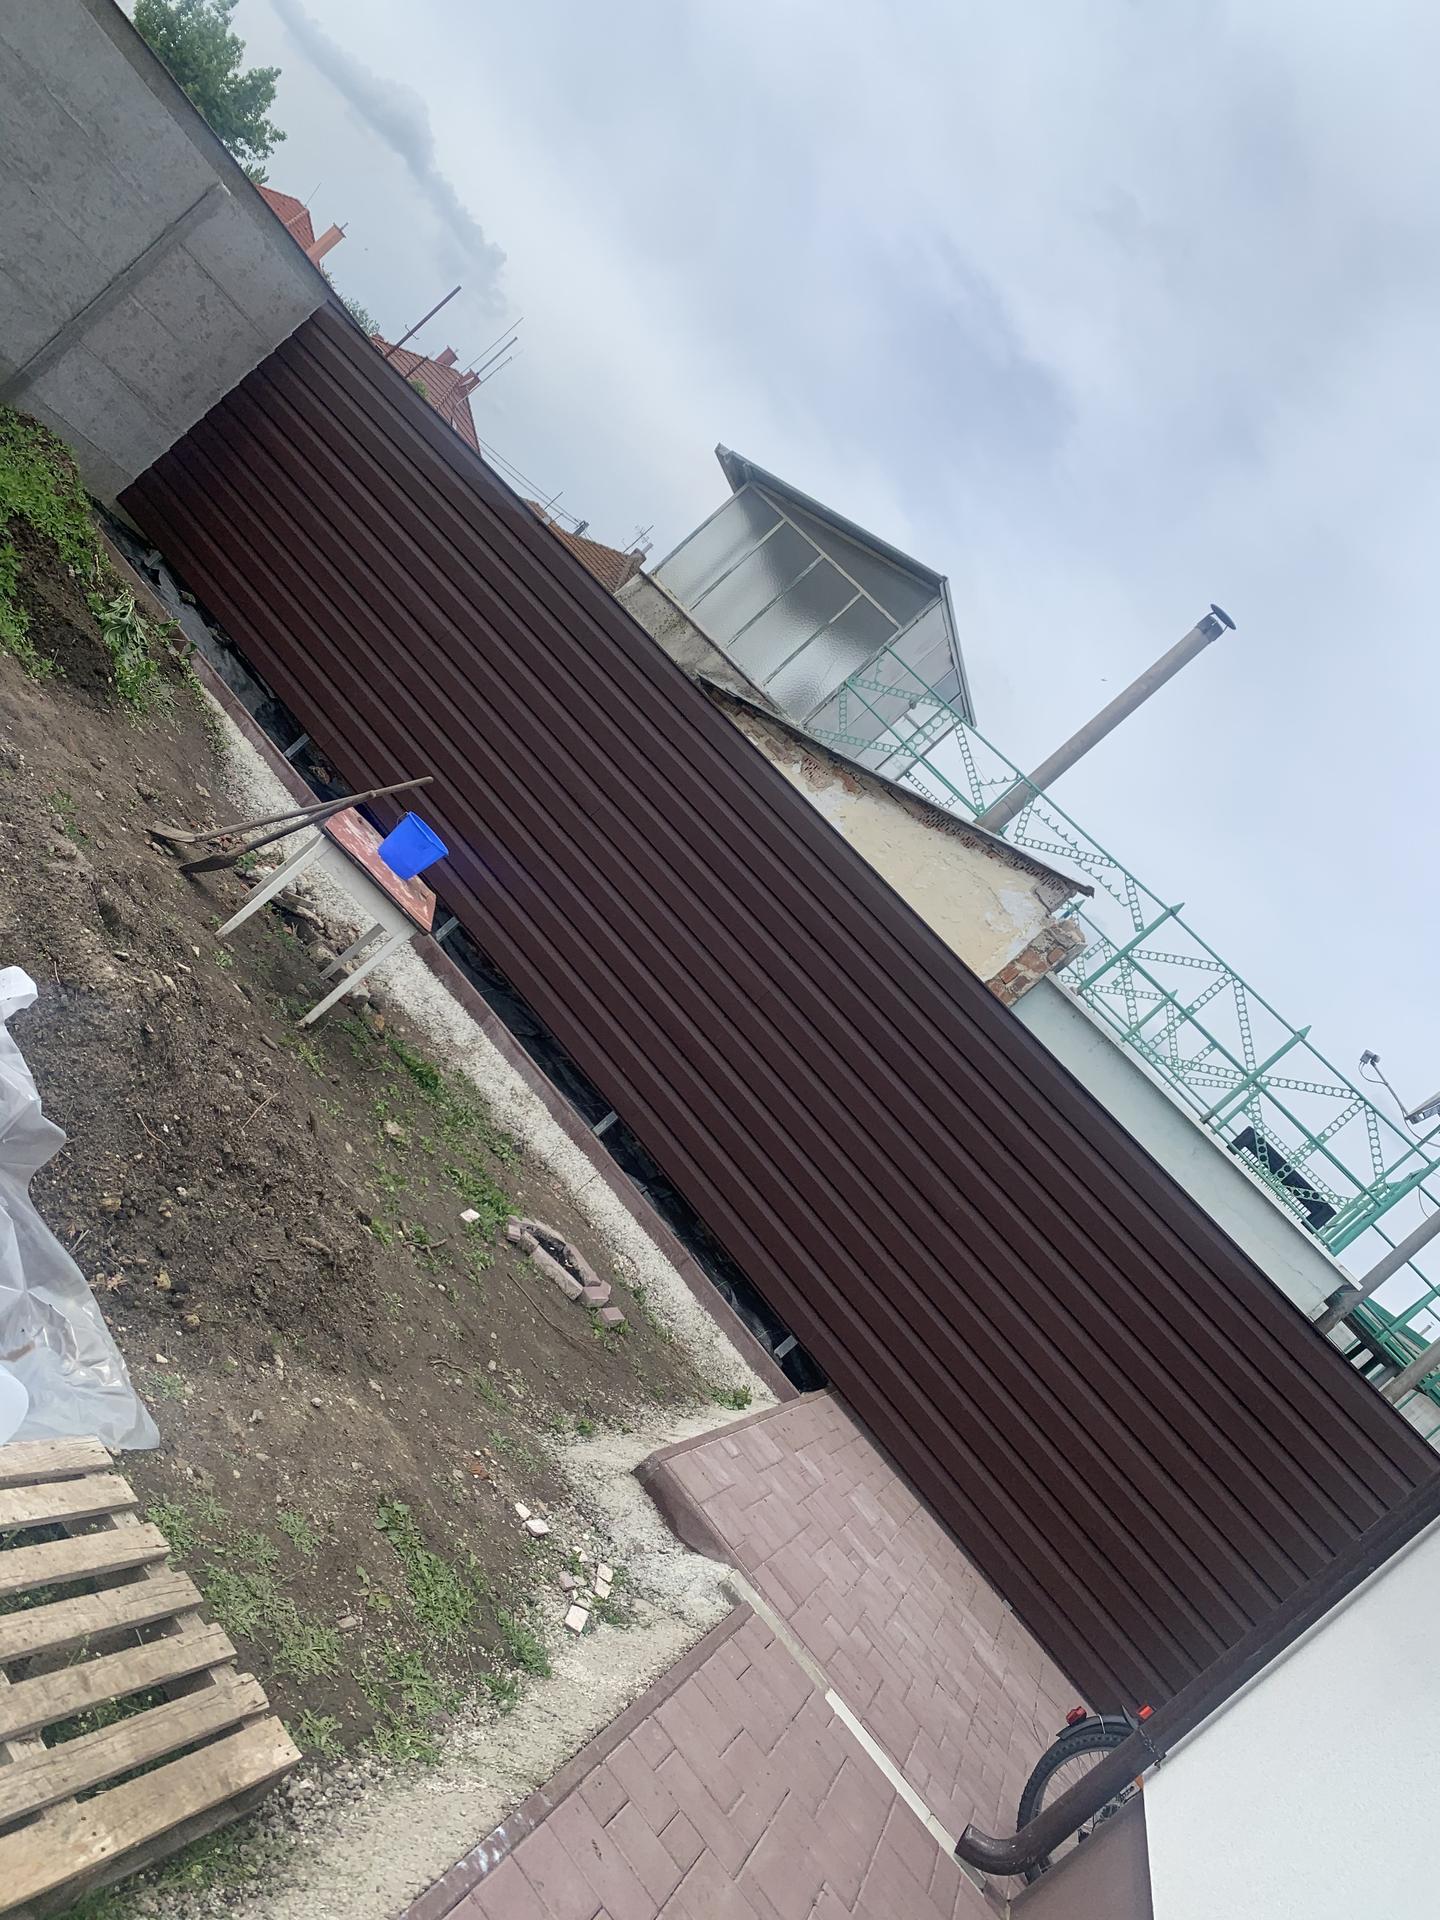 ♥️ Náš budúci domov ♥️ - huraaa konecne mame plot od suseda a nepozerame sa na tu osarpanu stenu :)